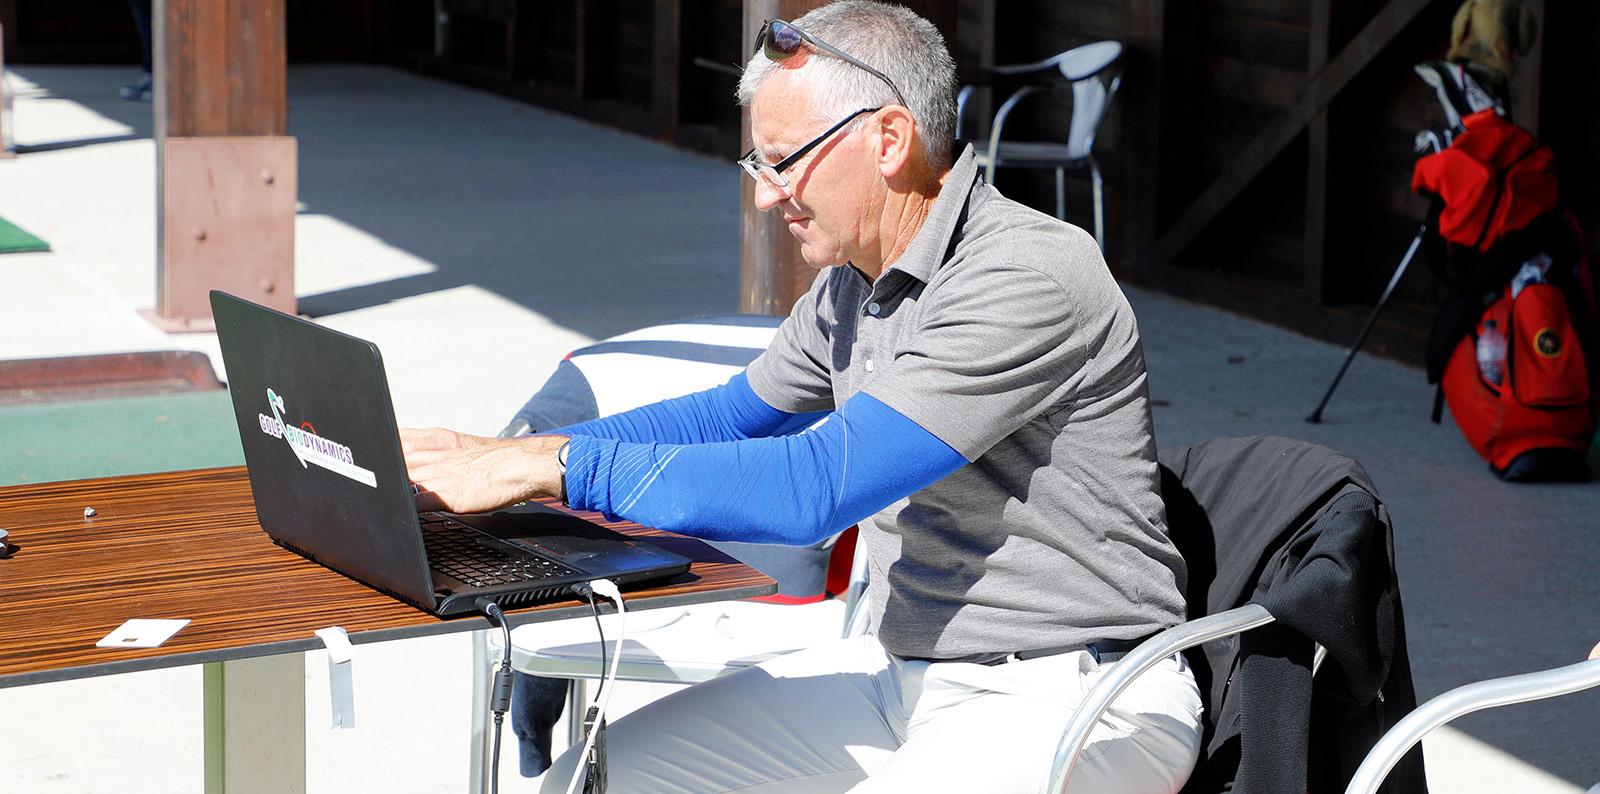 Golf BioDynamics Offers Remote Coaching